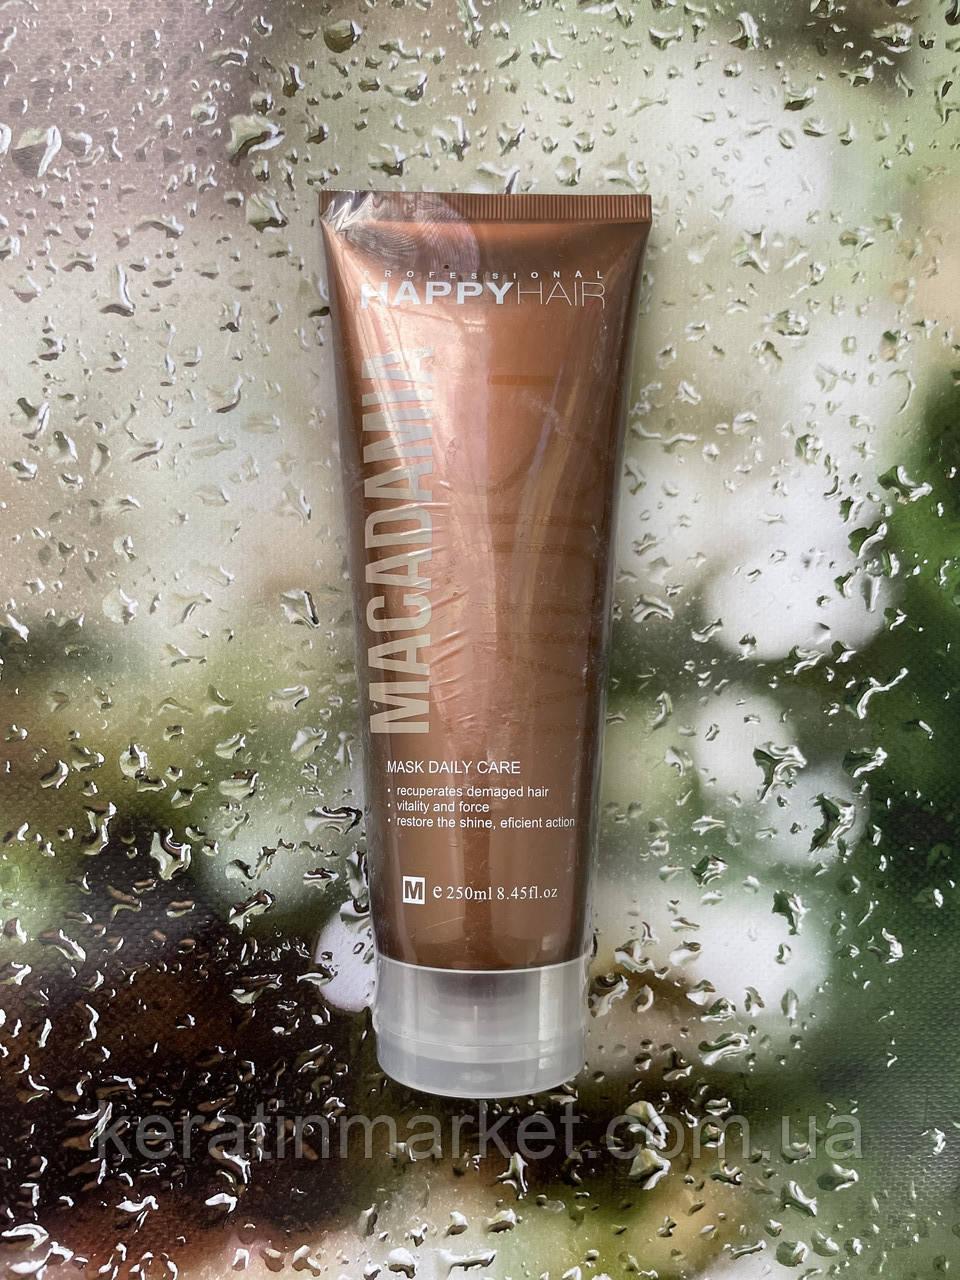 Маска для волосся Macadamia Happy Hair